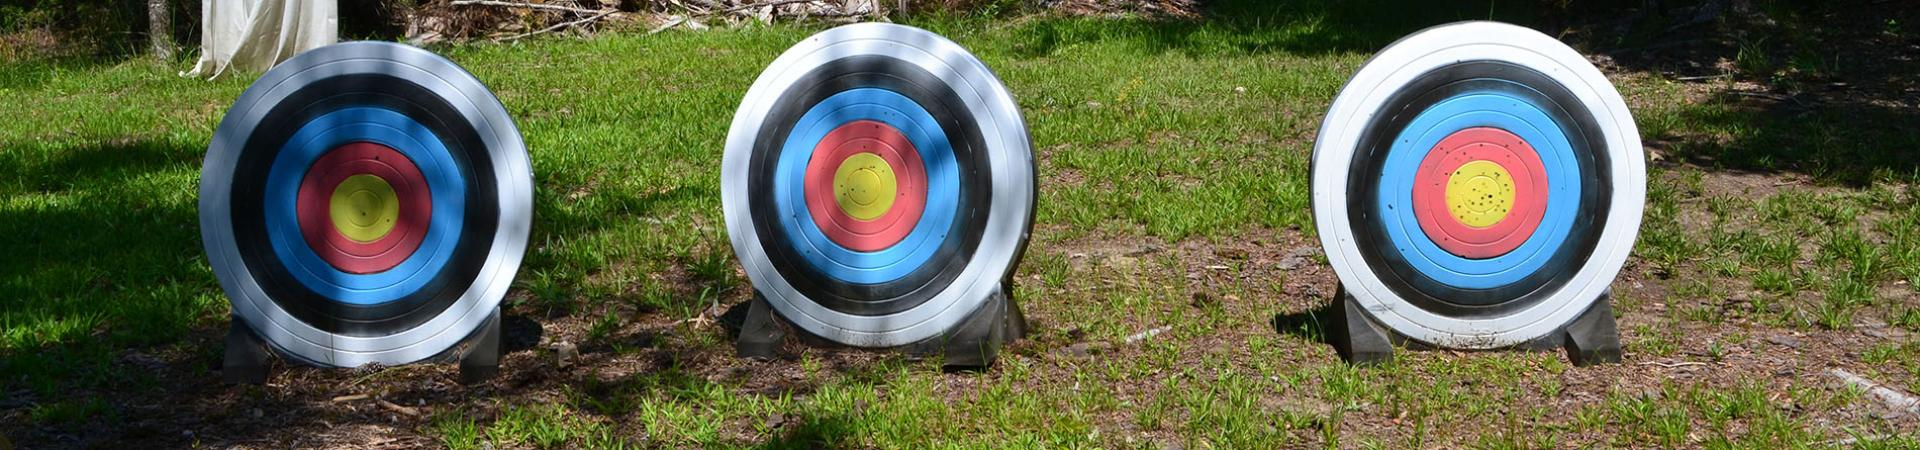 Bobby Brown Targets on Range